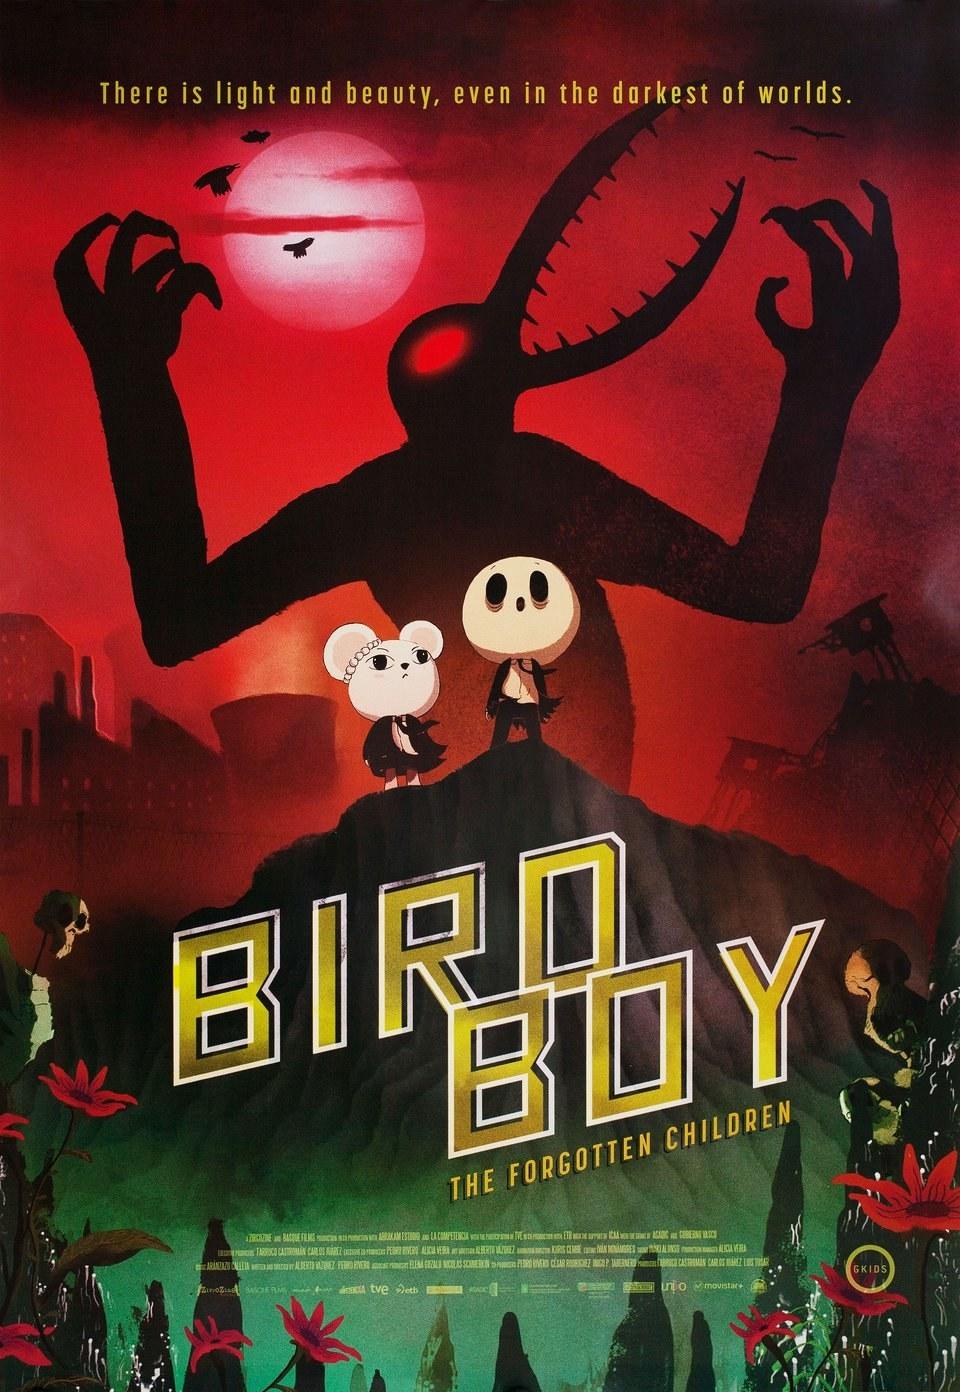 bird boy the forgotten children poster